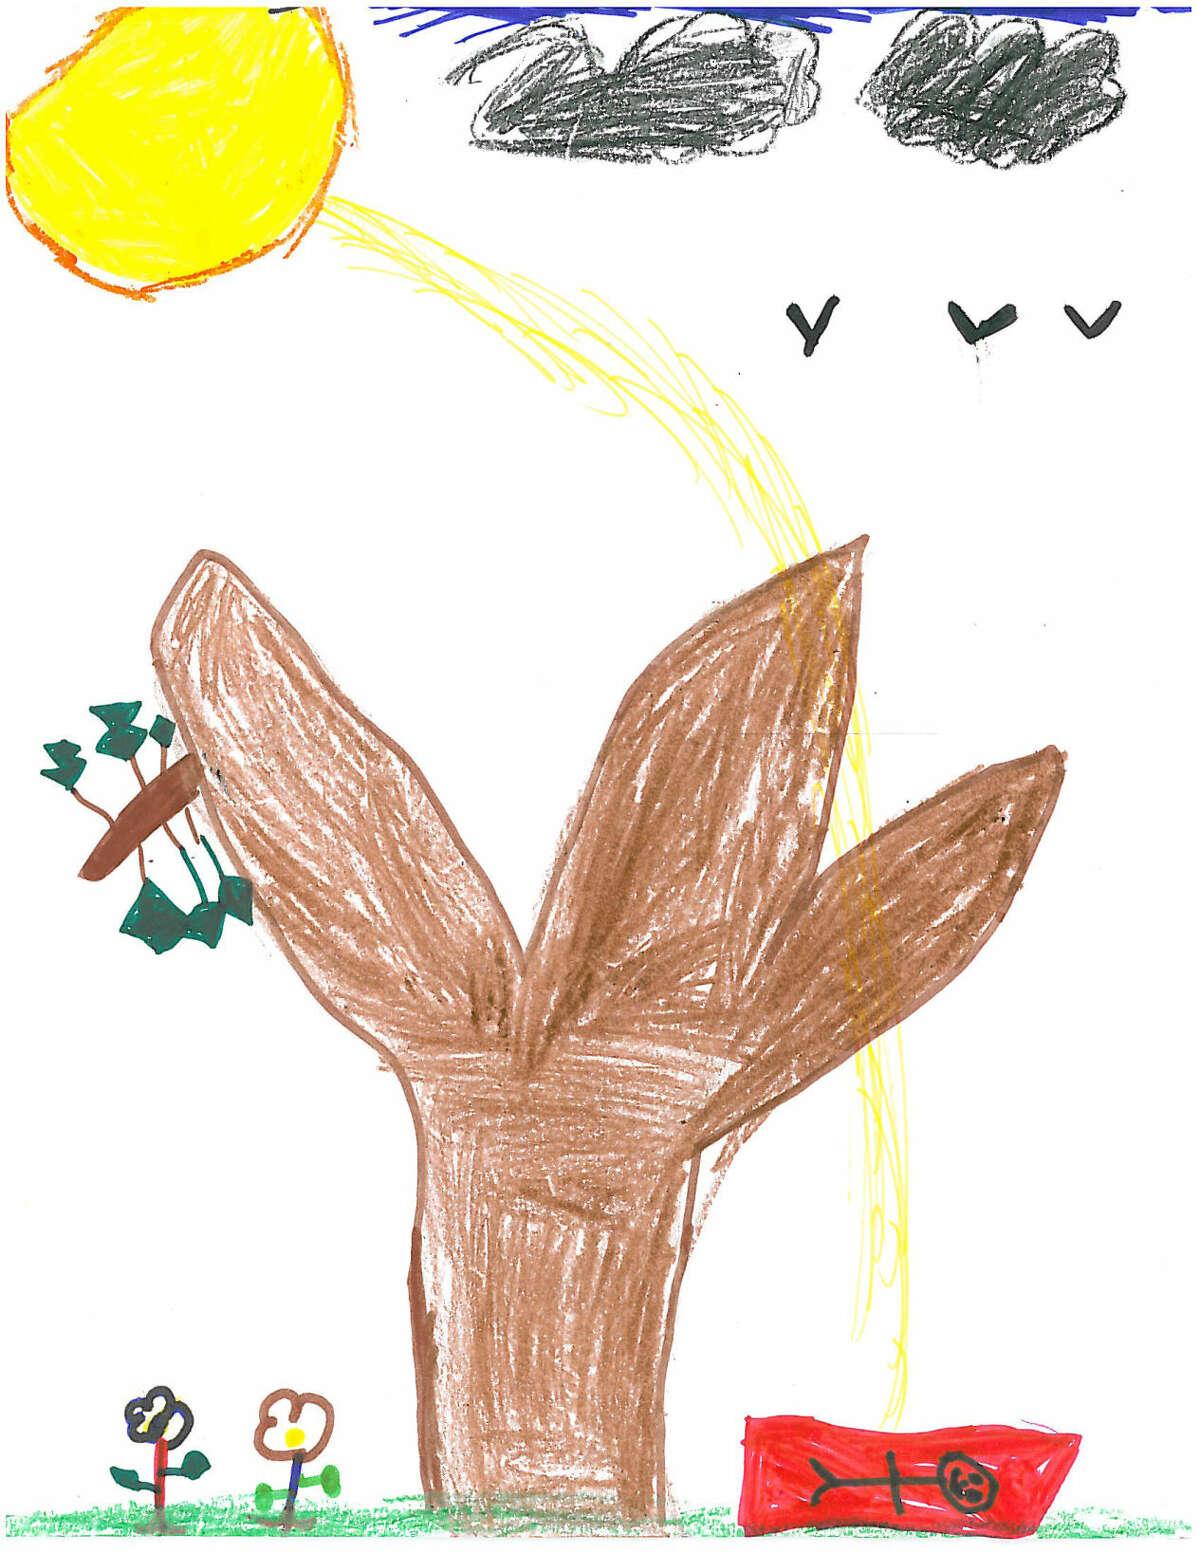 Weather Drawing 11-14-14 Jakara Murray-Leach, Kendall Elementary School